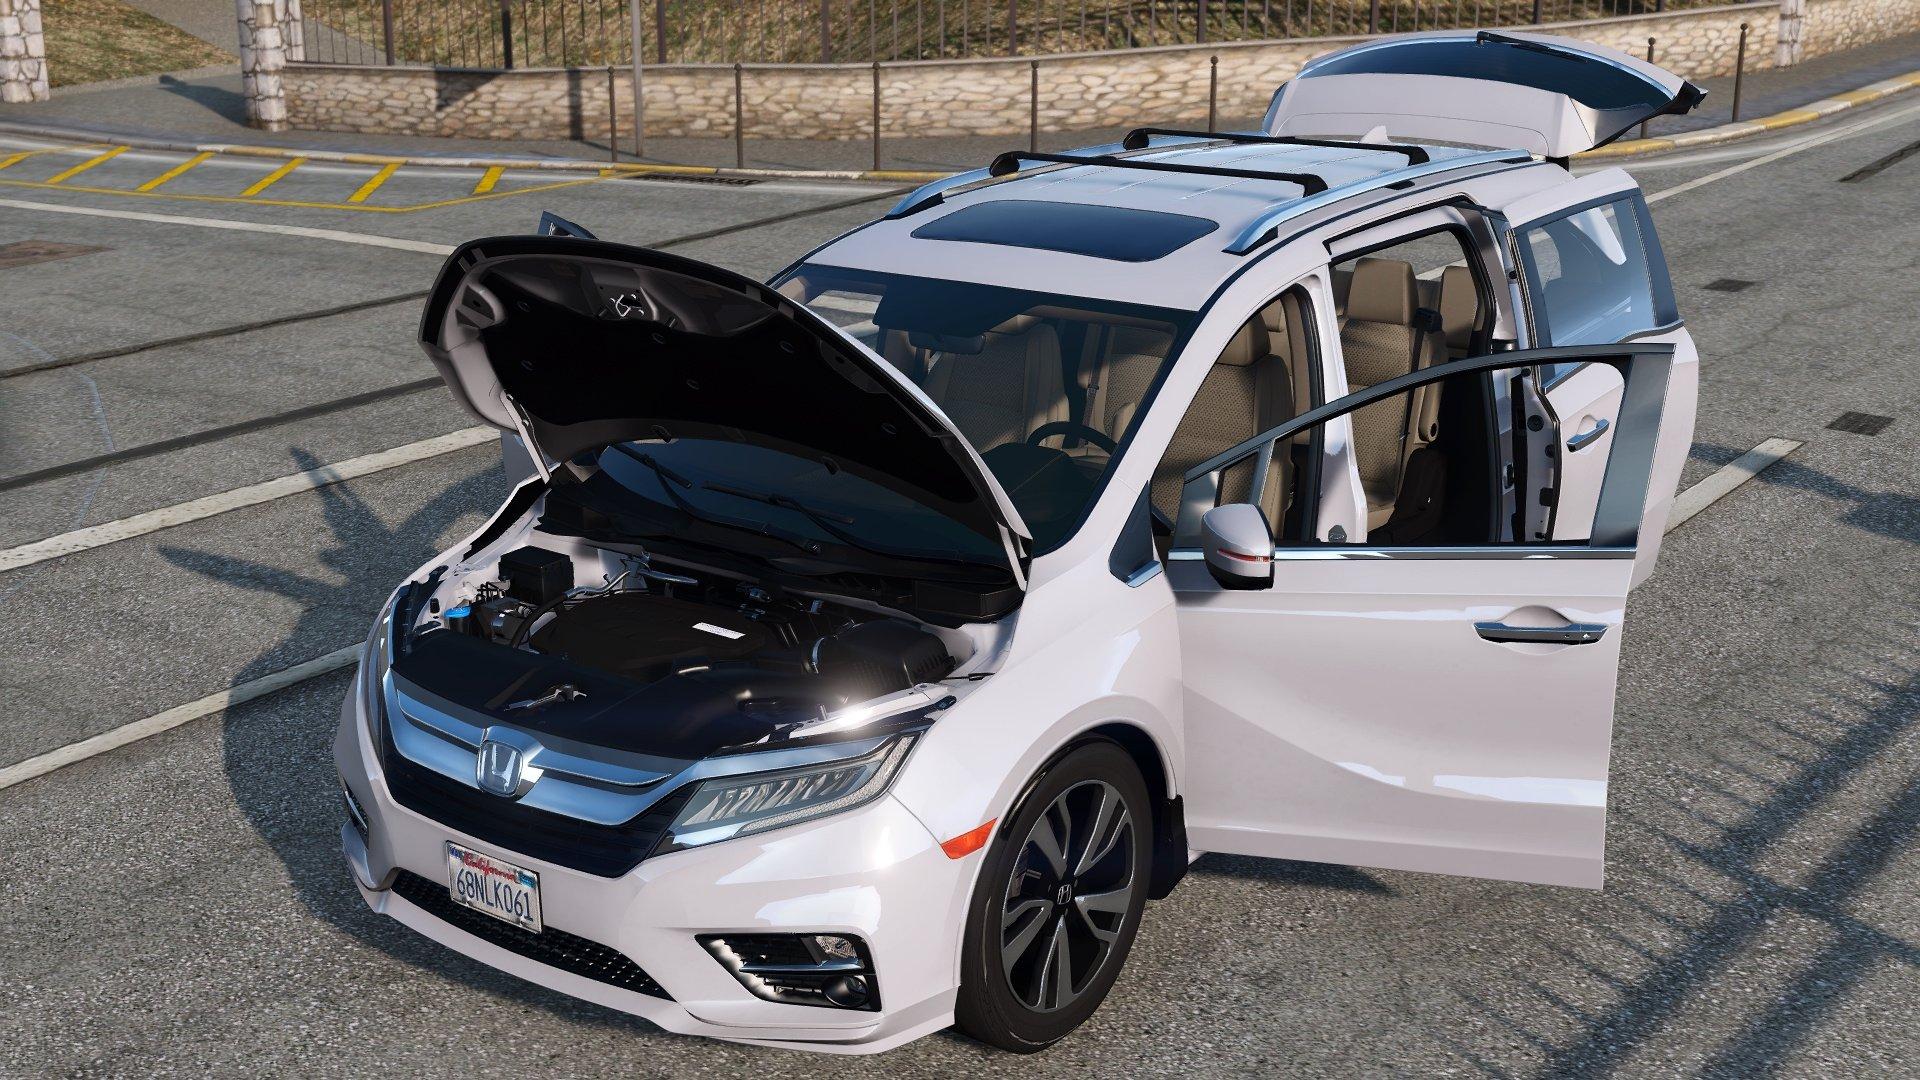 2015 Toyota Camry Xse >> 2019 Honda Odyssey Elite [Replace/Add-On] - GTA5-Mods.com